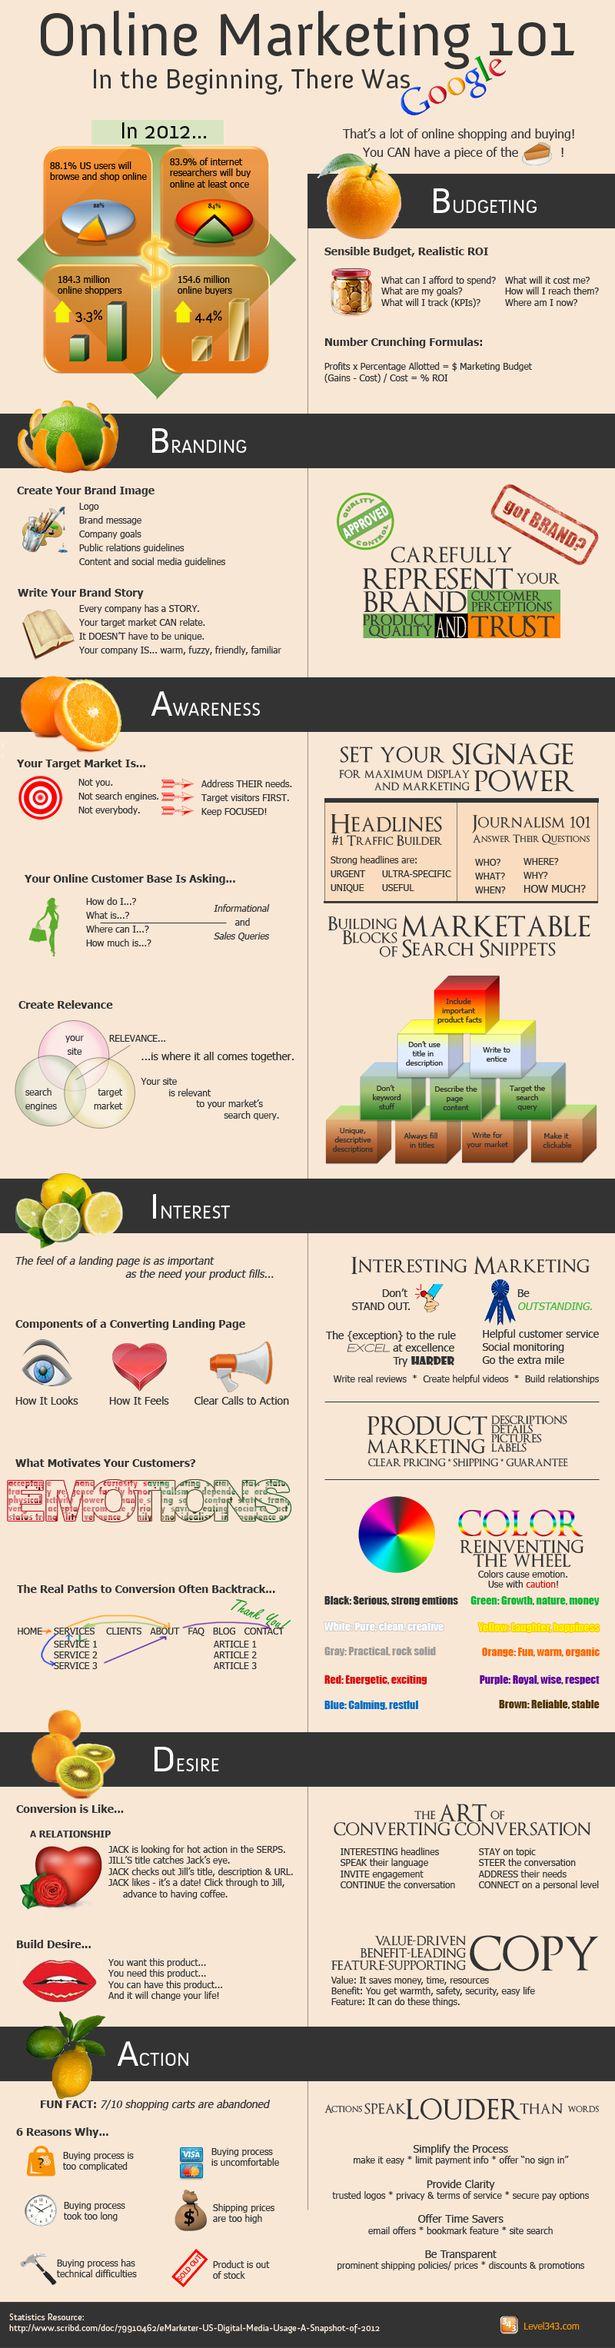 Online Marketing 101 #digitalmarketing: Online Marketing, Internet Marketing, Digital Marketing, Website, Web Site, Marketing 101, Social Media, 101 Infographic, Google Infographic